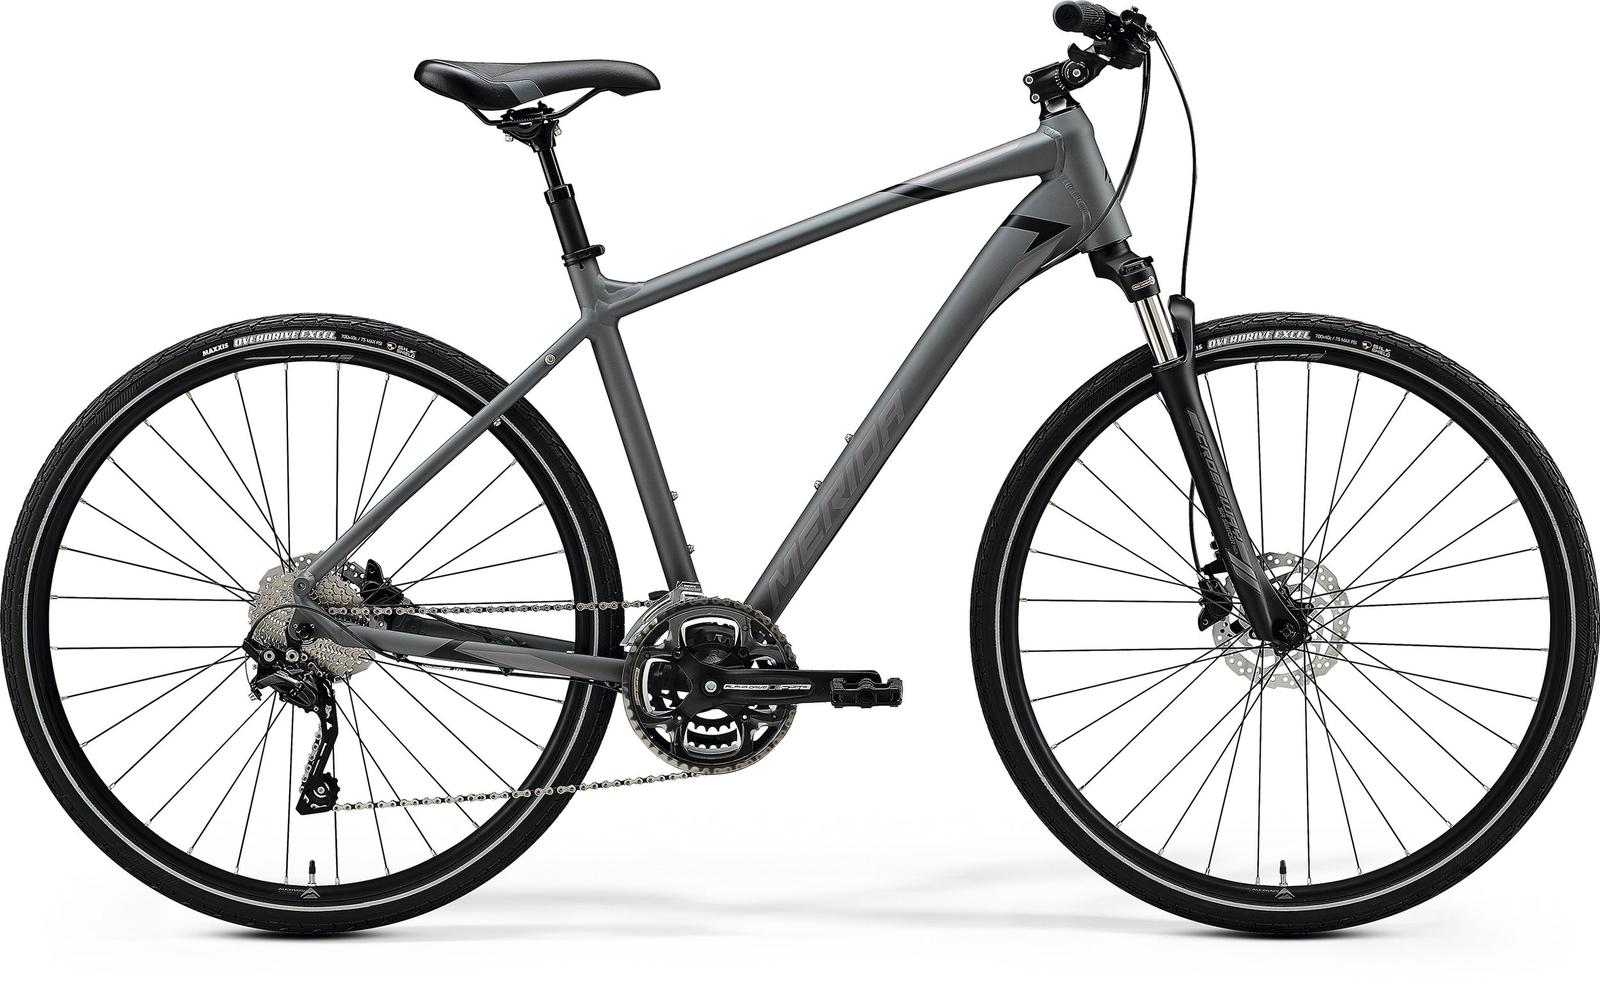 Bicicleta de trekking/oras barbati Merida Crossway 300 Gri/Negru 2020 imagine